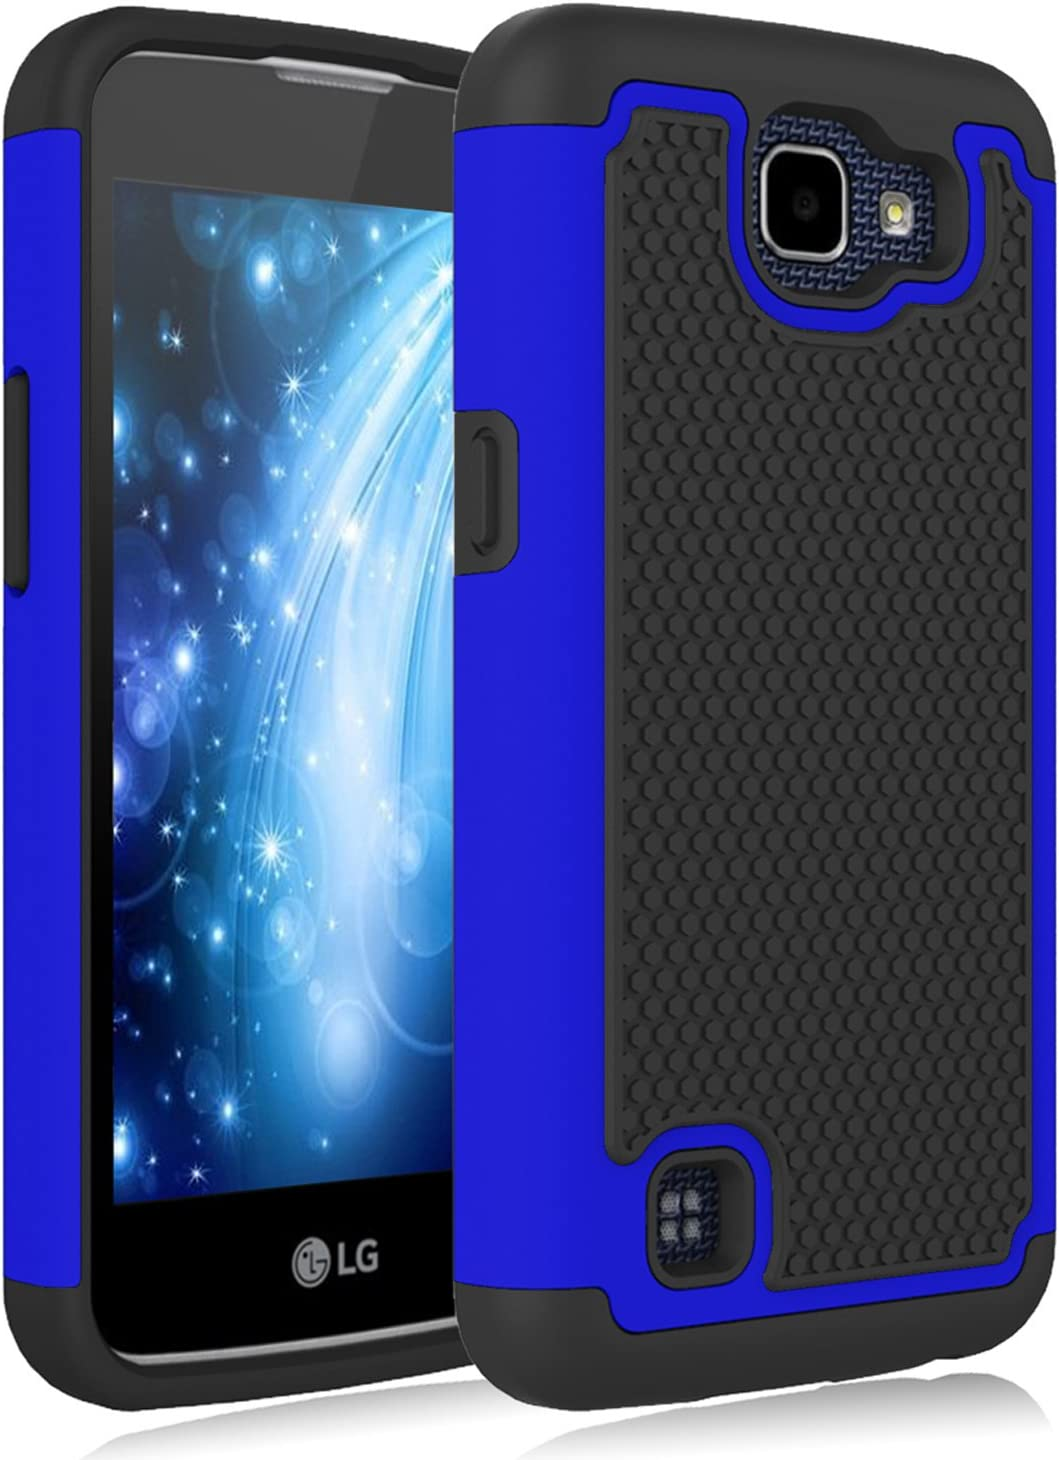 LG K4 Case, LG Rebel LTE Case, LG Optimus Zone 3 Case, LG Spree Case, Jeylly [Shock Proof] Scratch Absorbing Hybrid Rubber Plastic Impact Defender Rugged Slim Hard Case Cover Shell for LG K4 - Blue